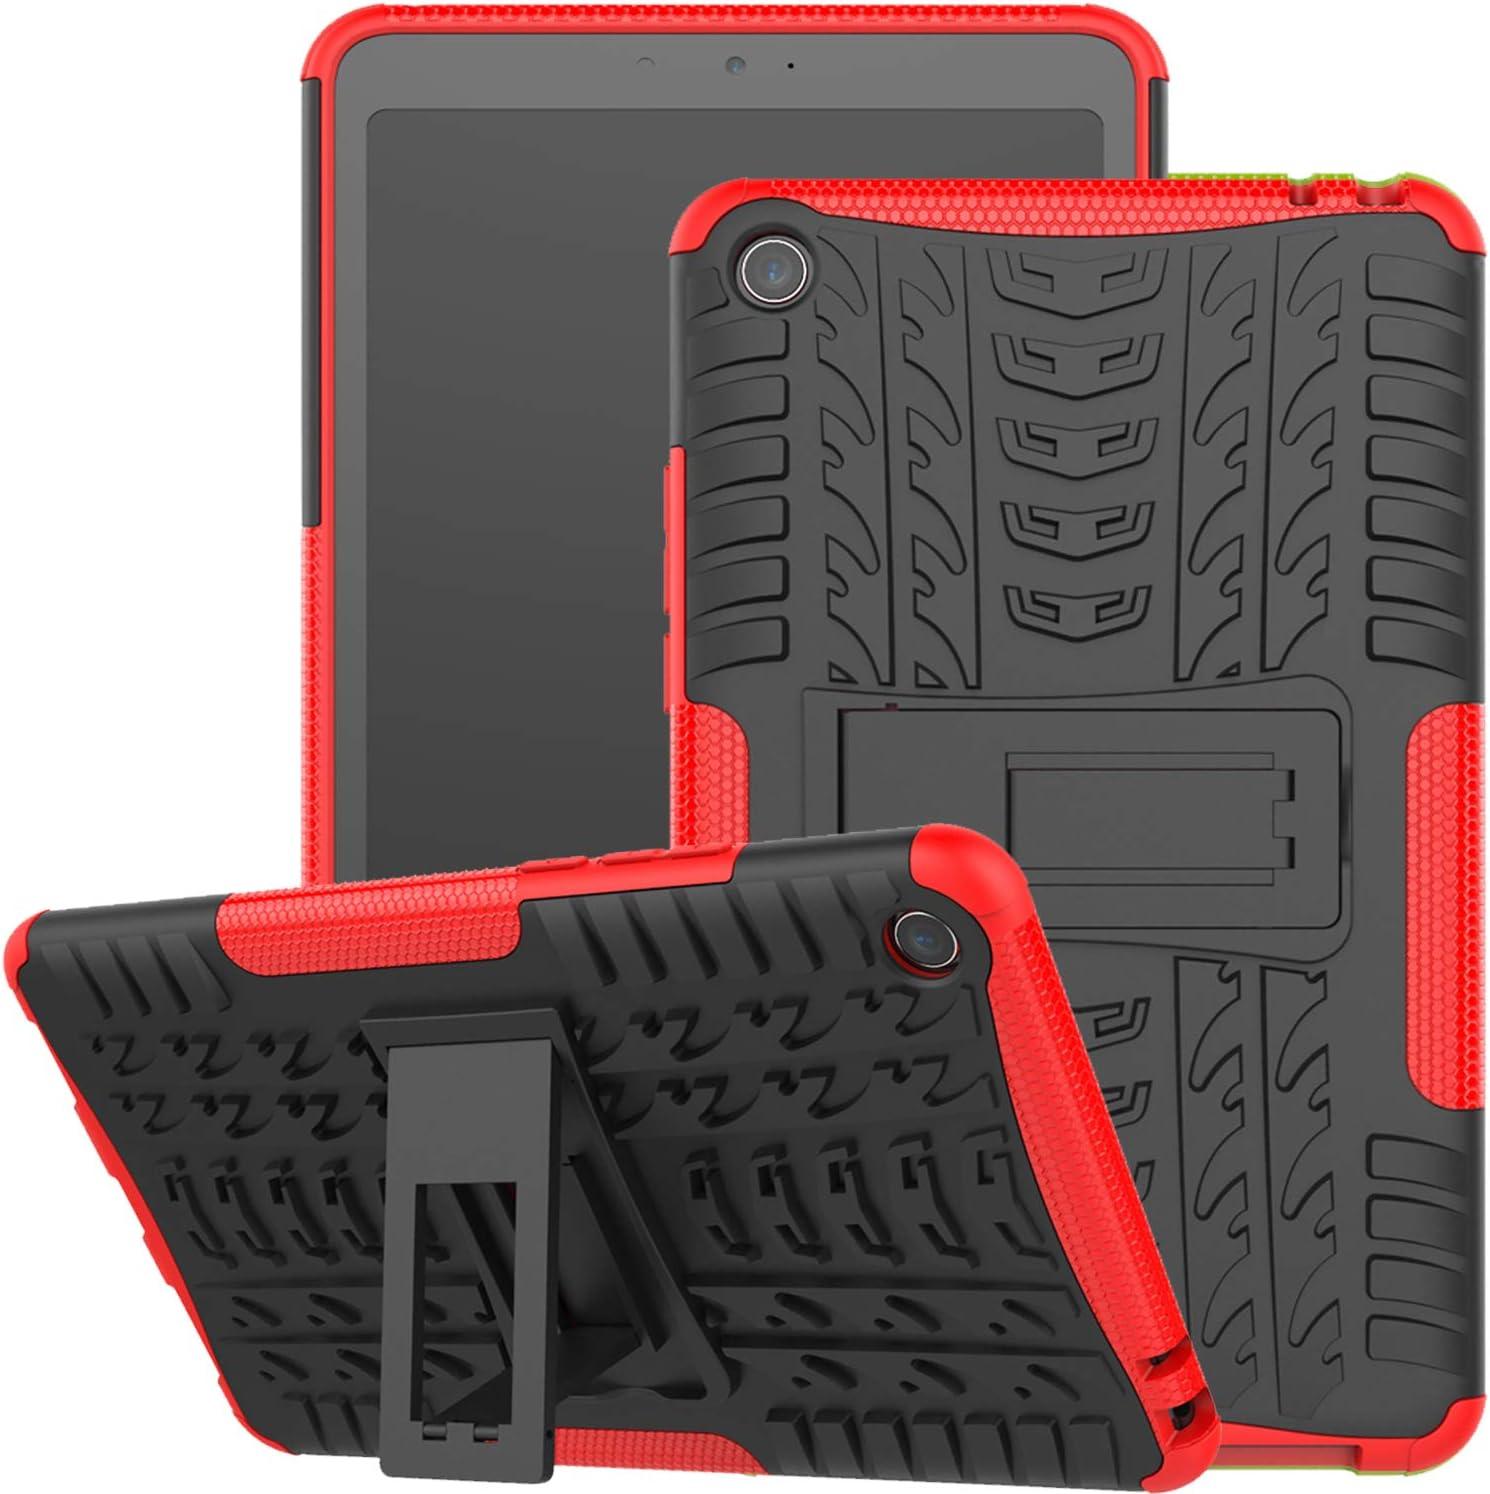 Funda Xiaomi Mi Pad 4, Jhxtech Armor Style Hybrid PC + TPU Funda protectora con soporte para Xiaomi Mi Pad 4 Tablet